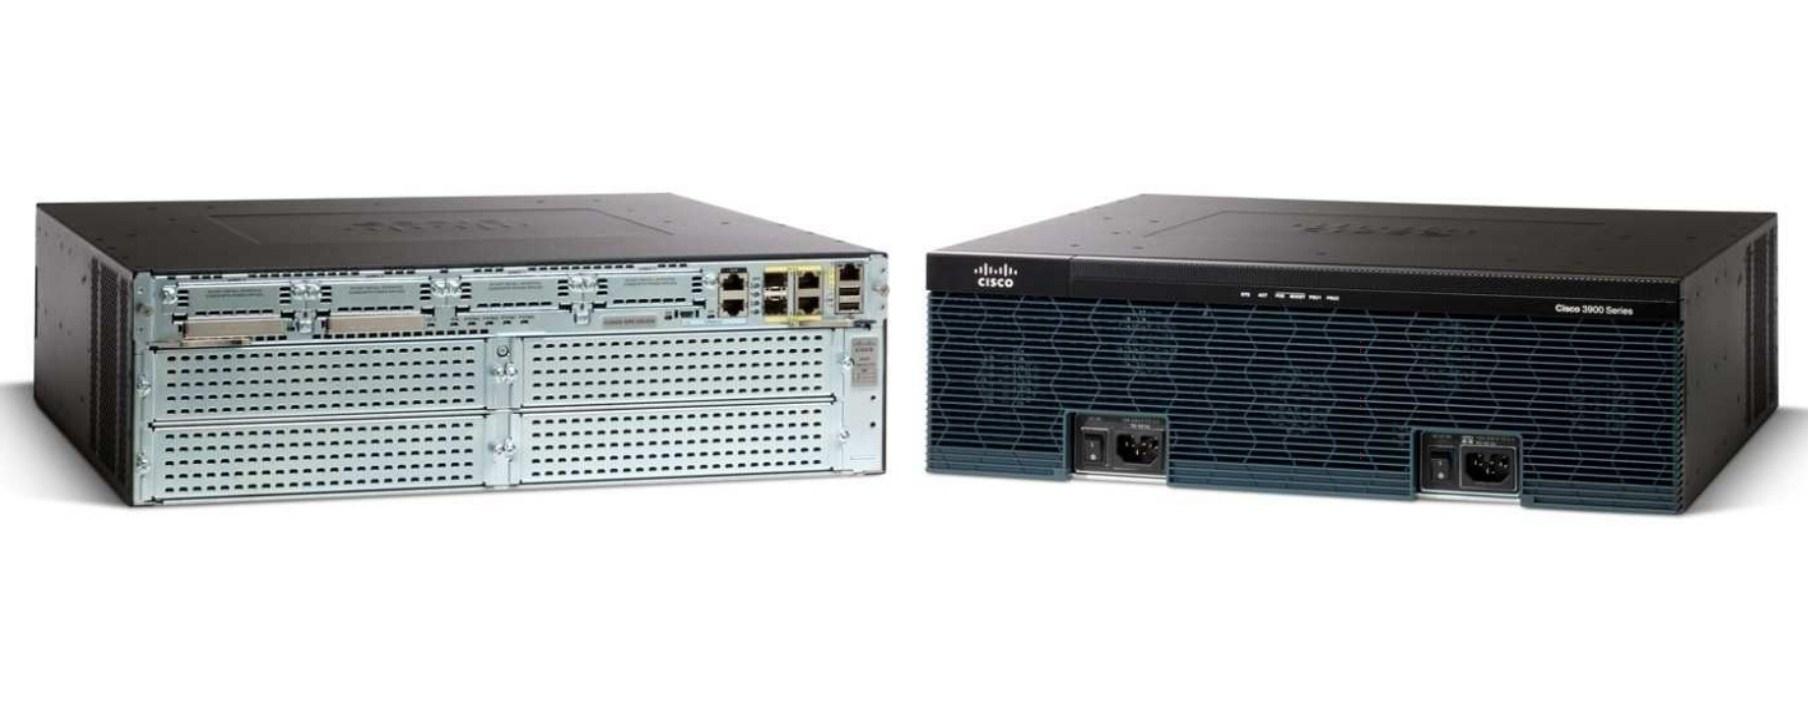 Маршрутизатор Cisco 3925-V/K9 (134-216) - 1